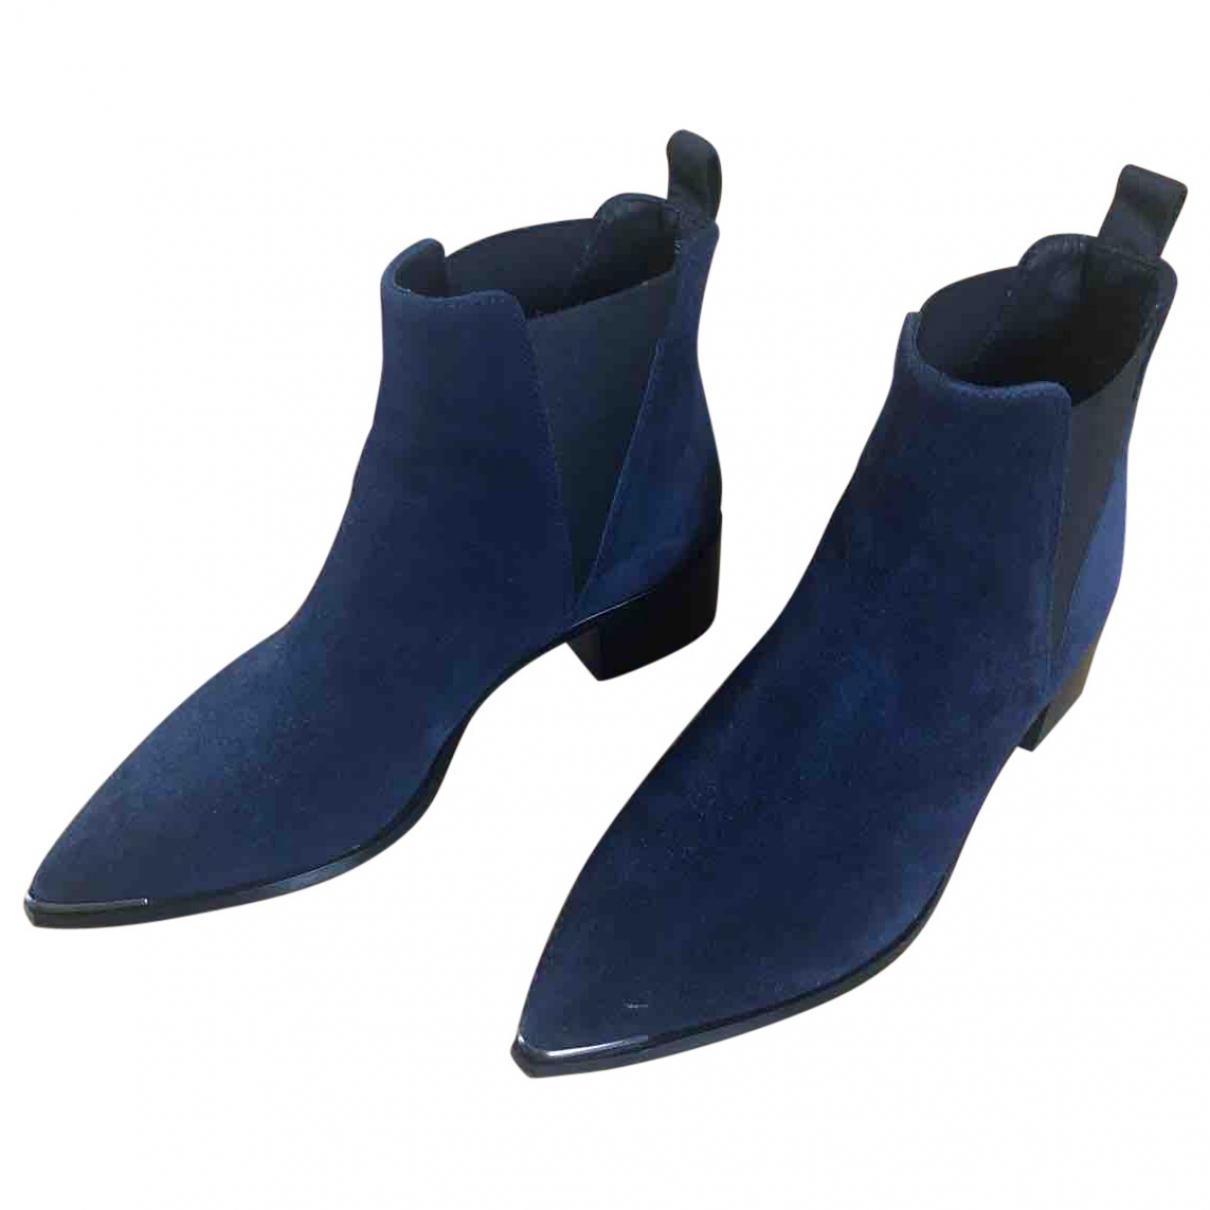 Acne Studios Jensen / Jenny Navy Suede Boots for Women 36 EU